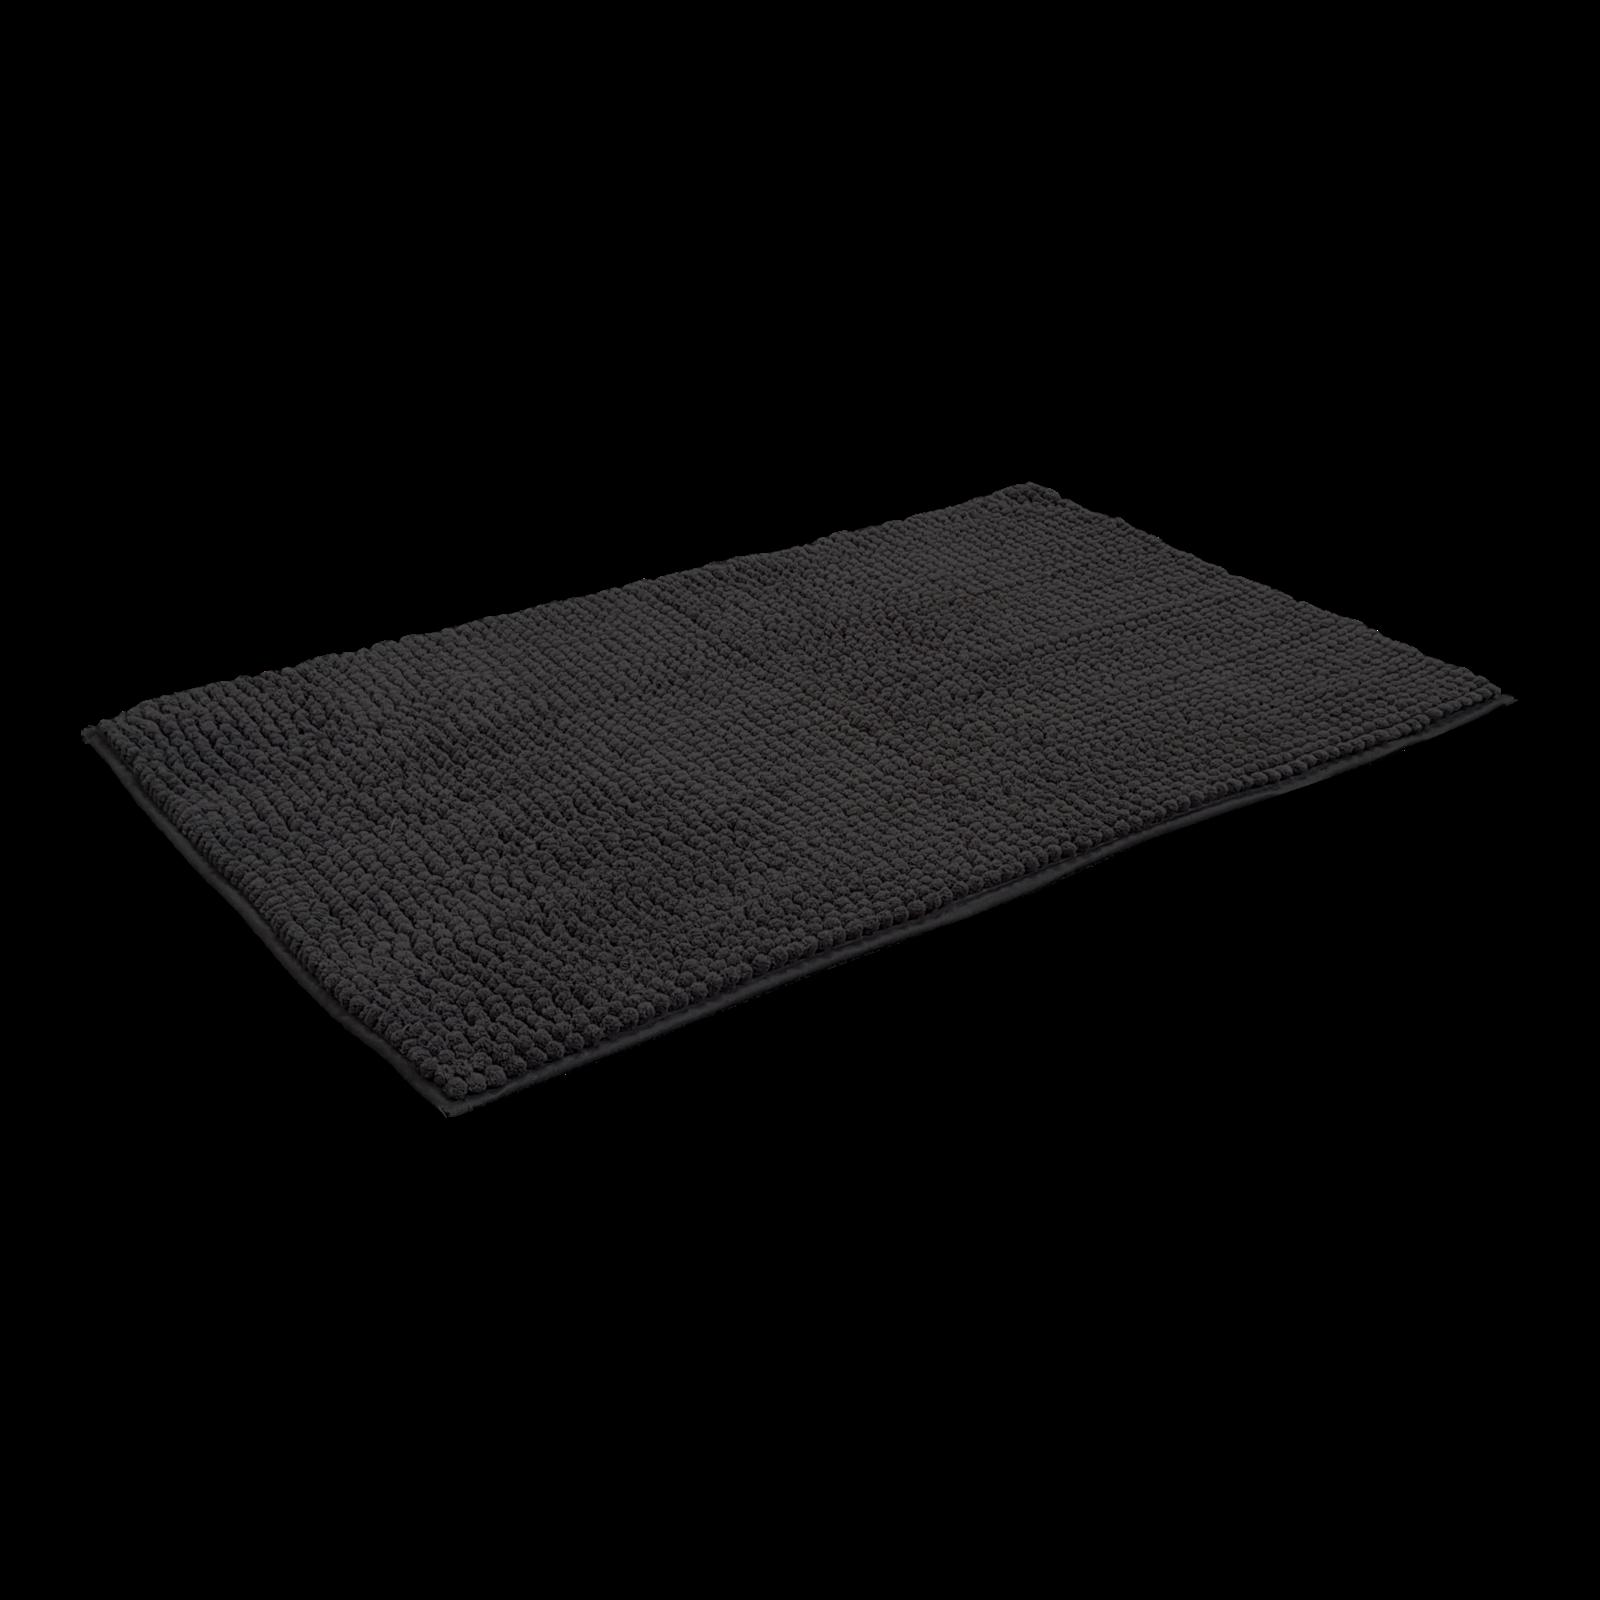 Axton 50 x 80cm Black Duke Bathmat